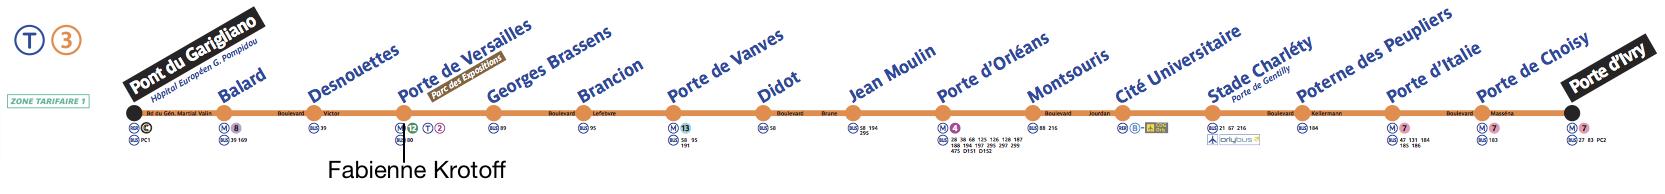 Contact fabienne krotoff ost opathe d o for Porte de versailles plan